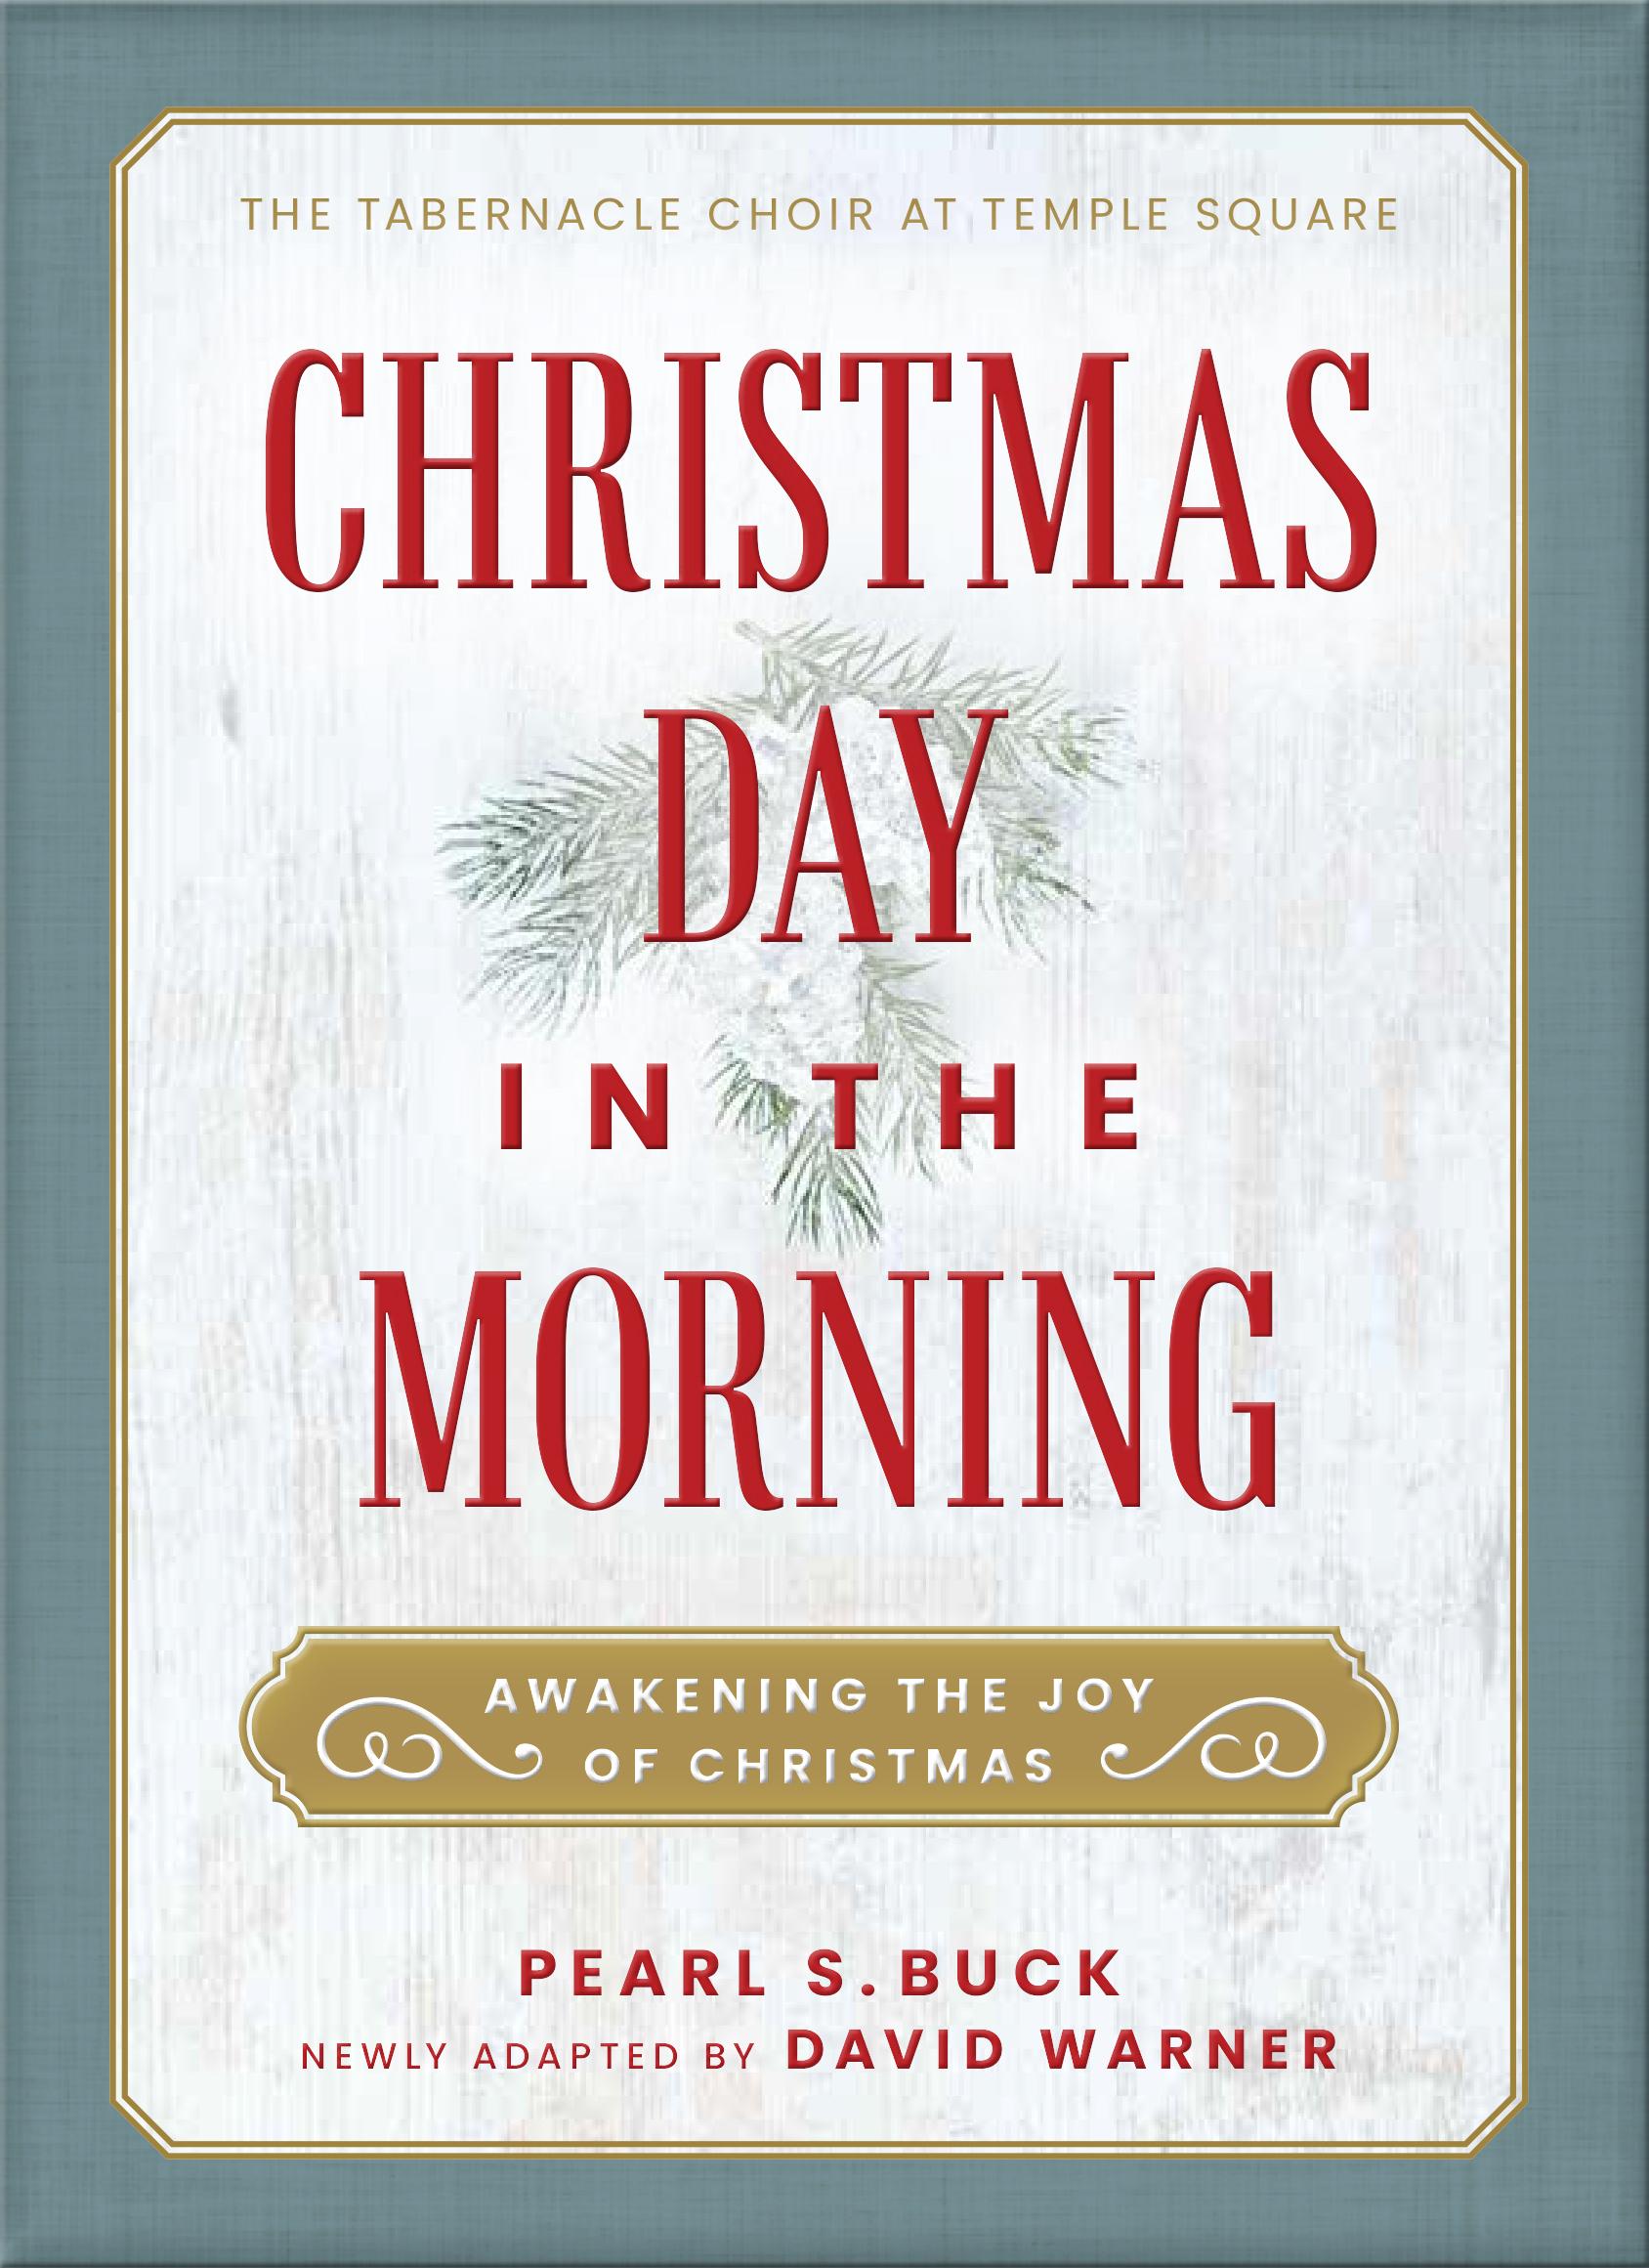 Christmas Day in the Morning: Awakening the Joy of Christmas